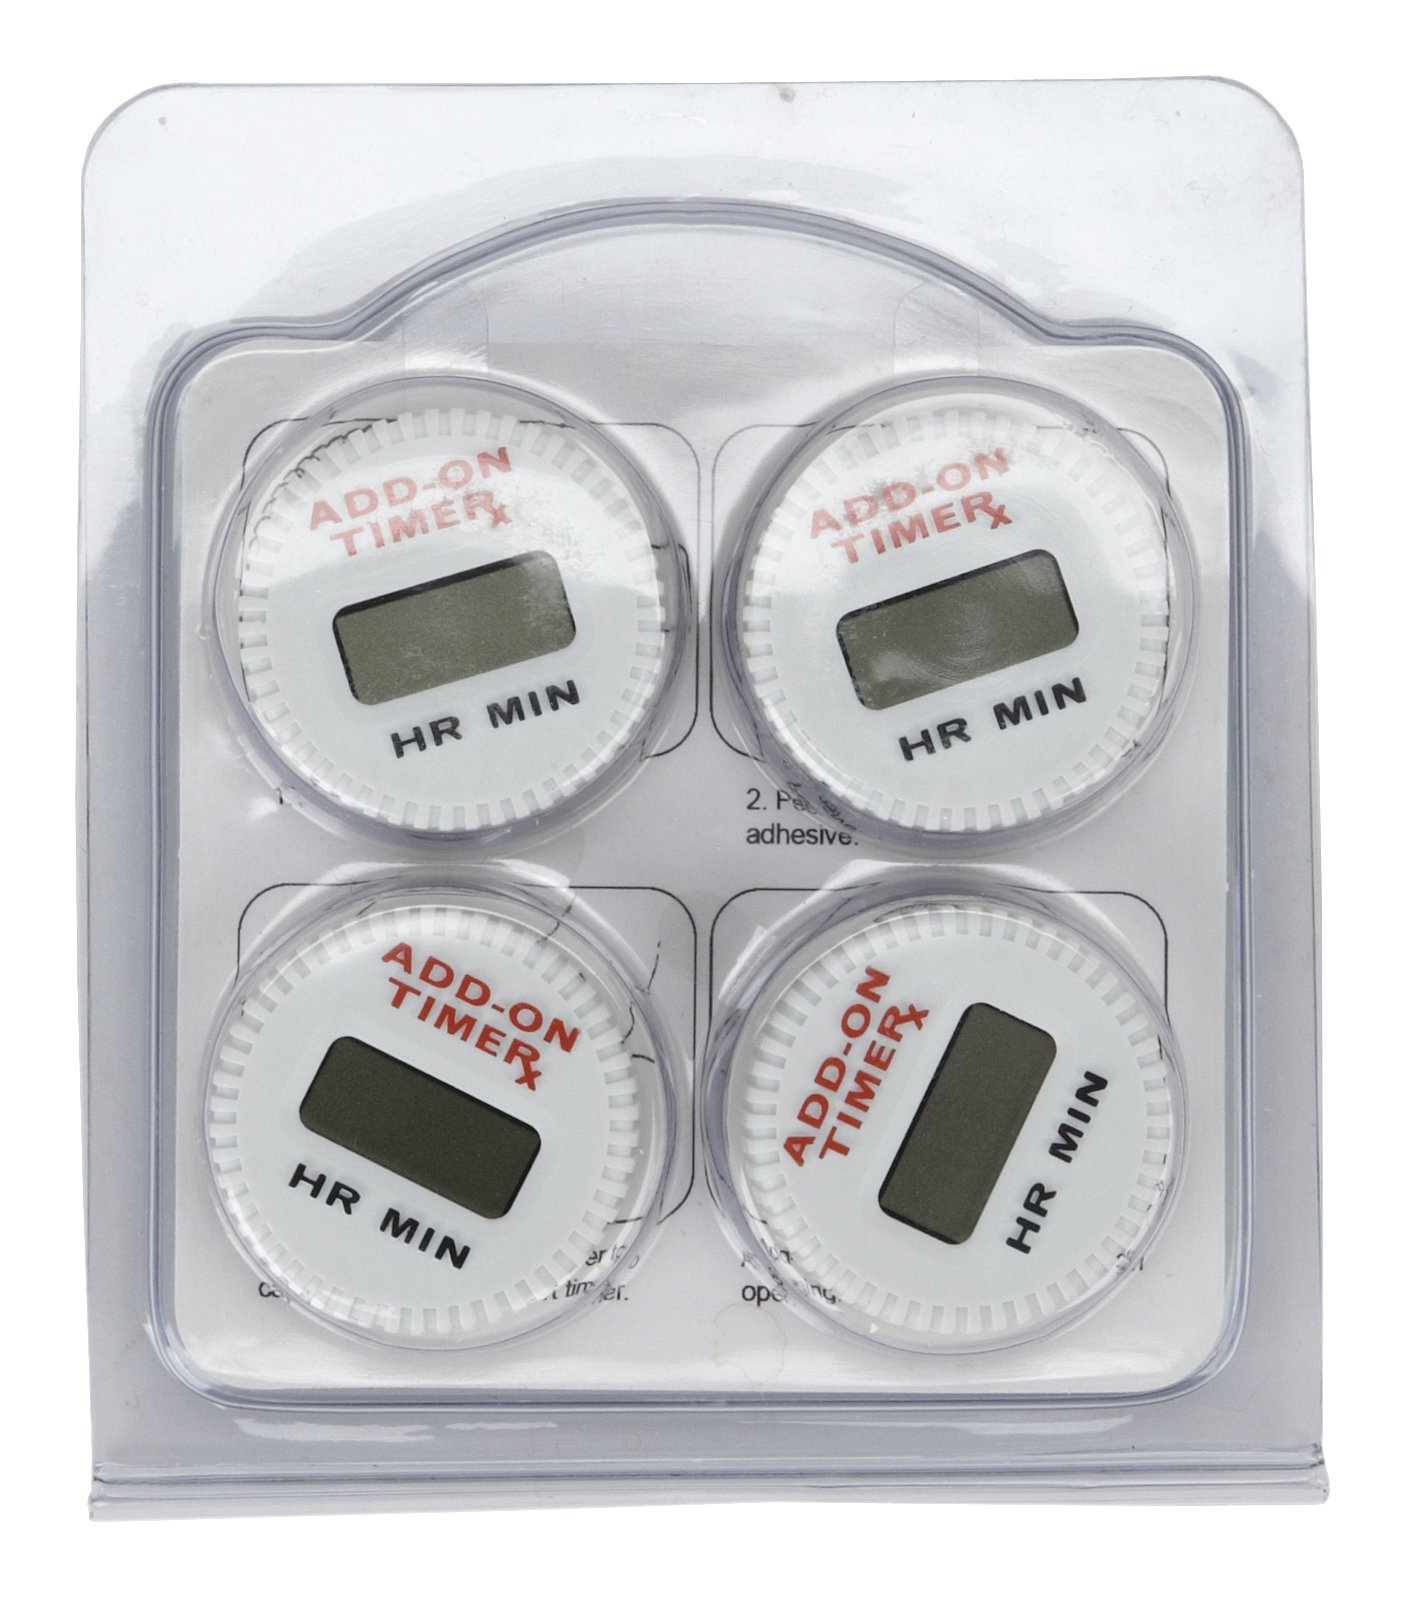 Medicine Bottle Add-On-Timer - Resets everytime you close your medication cap. (4)